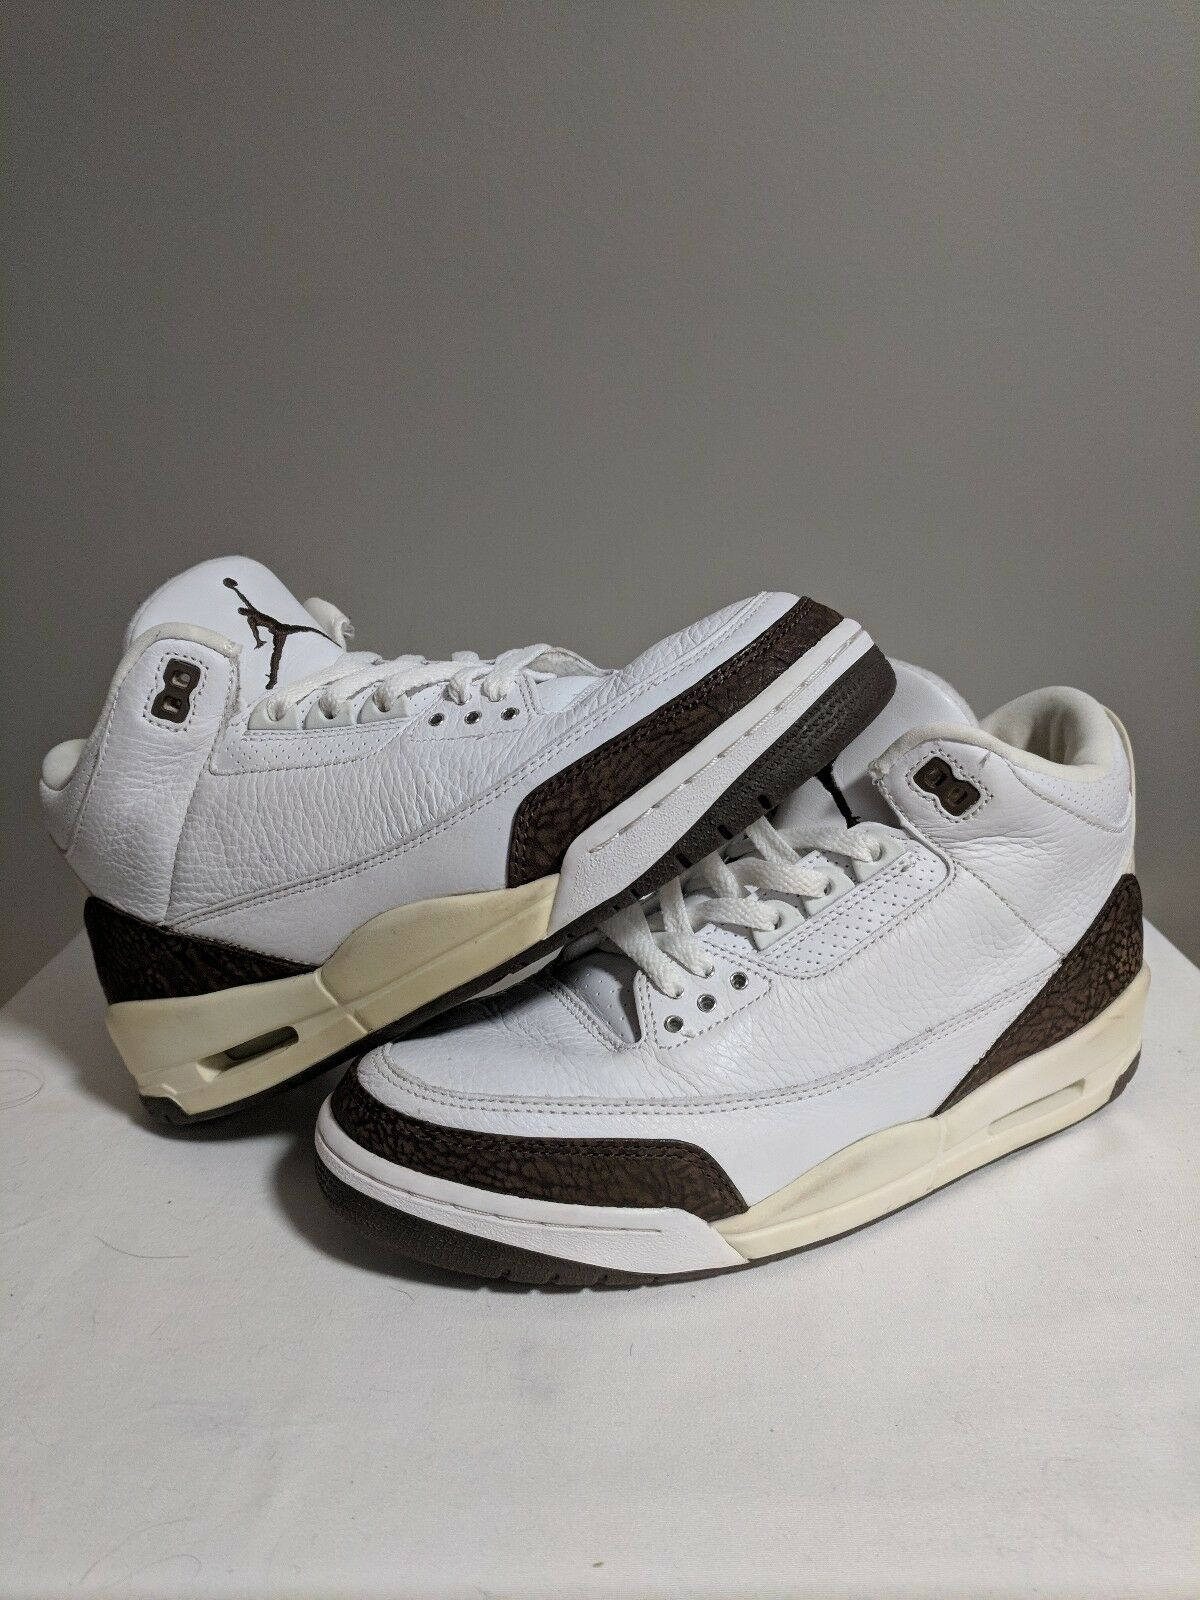 Jordan Retro 3  Dark Mocha Marronee bianca Sz 9.5